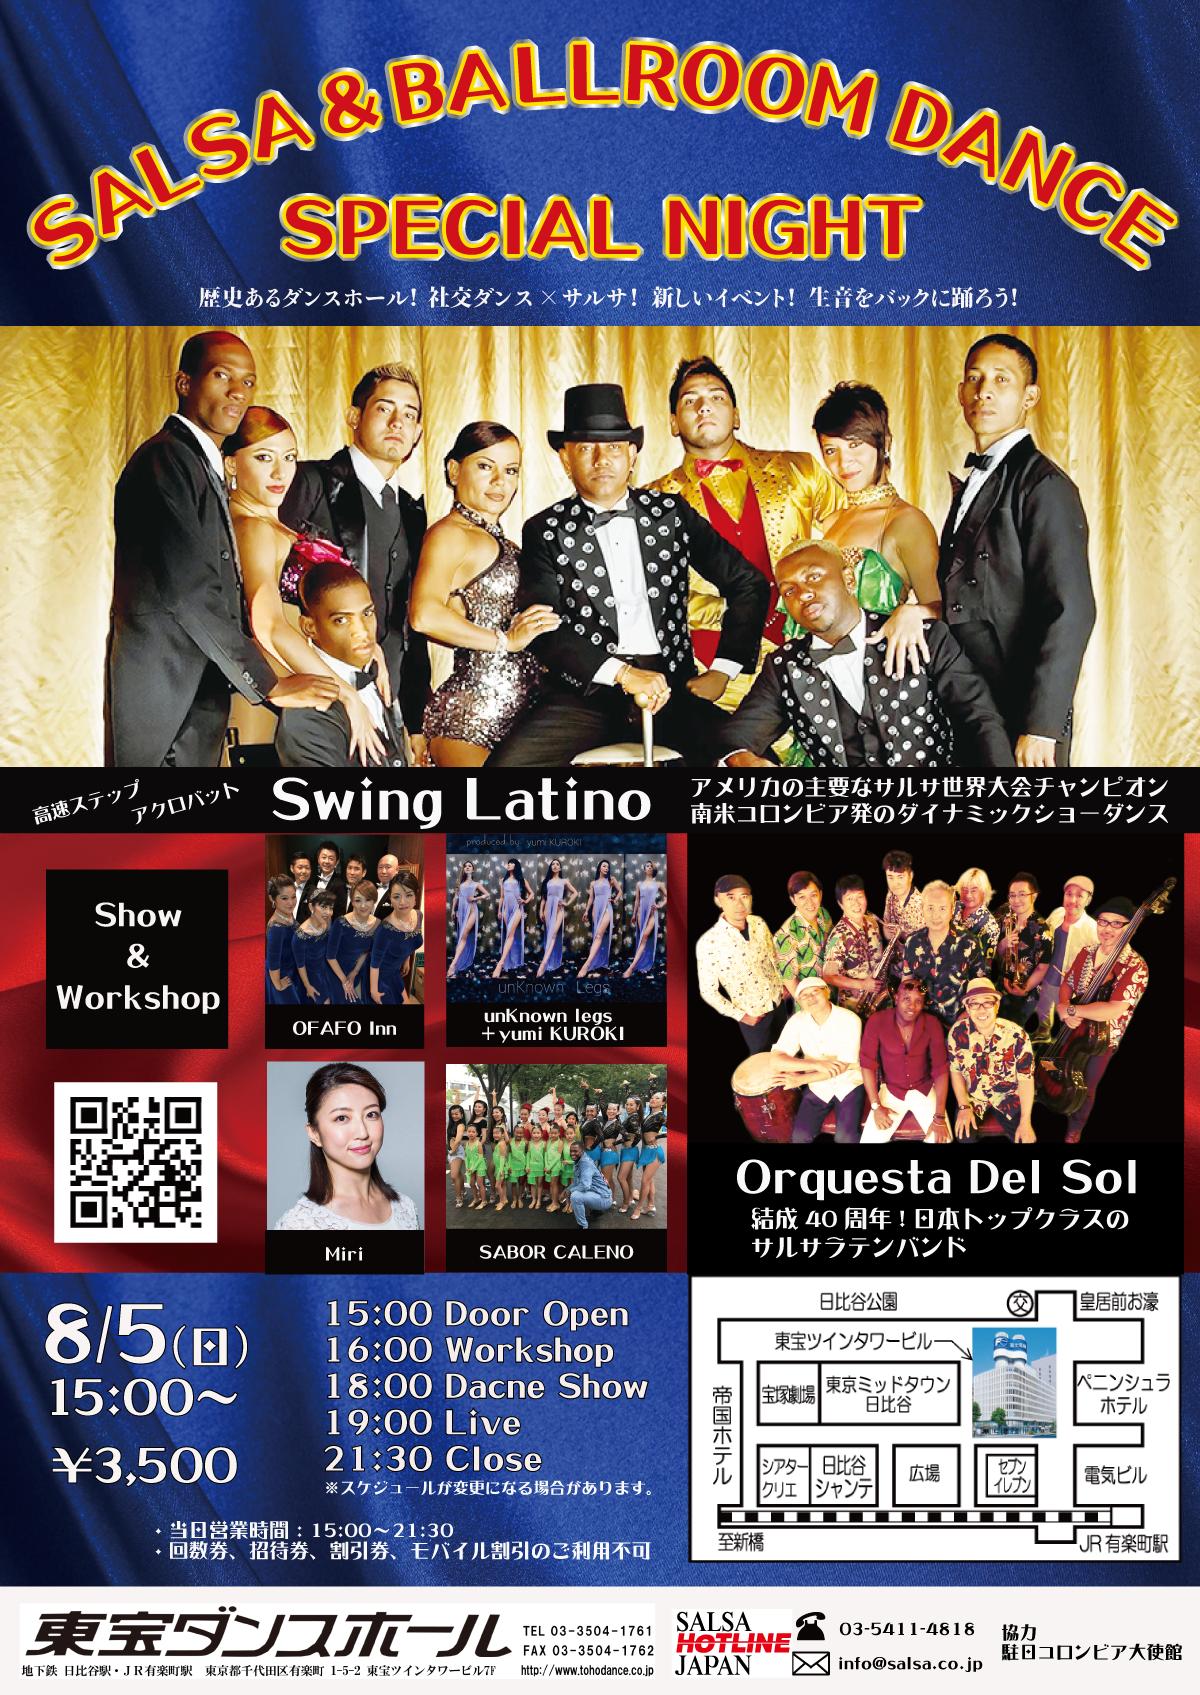 SALSA BALLROOM DANCE SPECIAL NIGHT スペシャルゲスト Swing Latino , Orquesta Del Sol、OFAFO Inn、unKnown legs +yumi KUROKI、Sabor Caleno、Miri @ 東宝ダンスホール